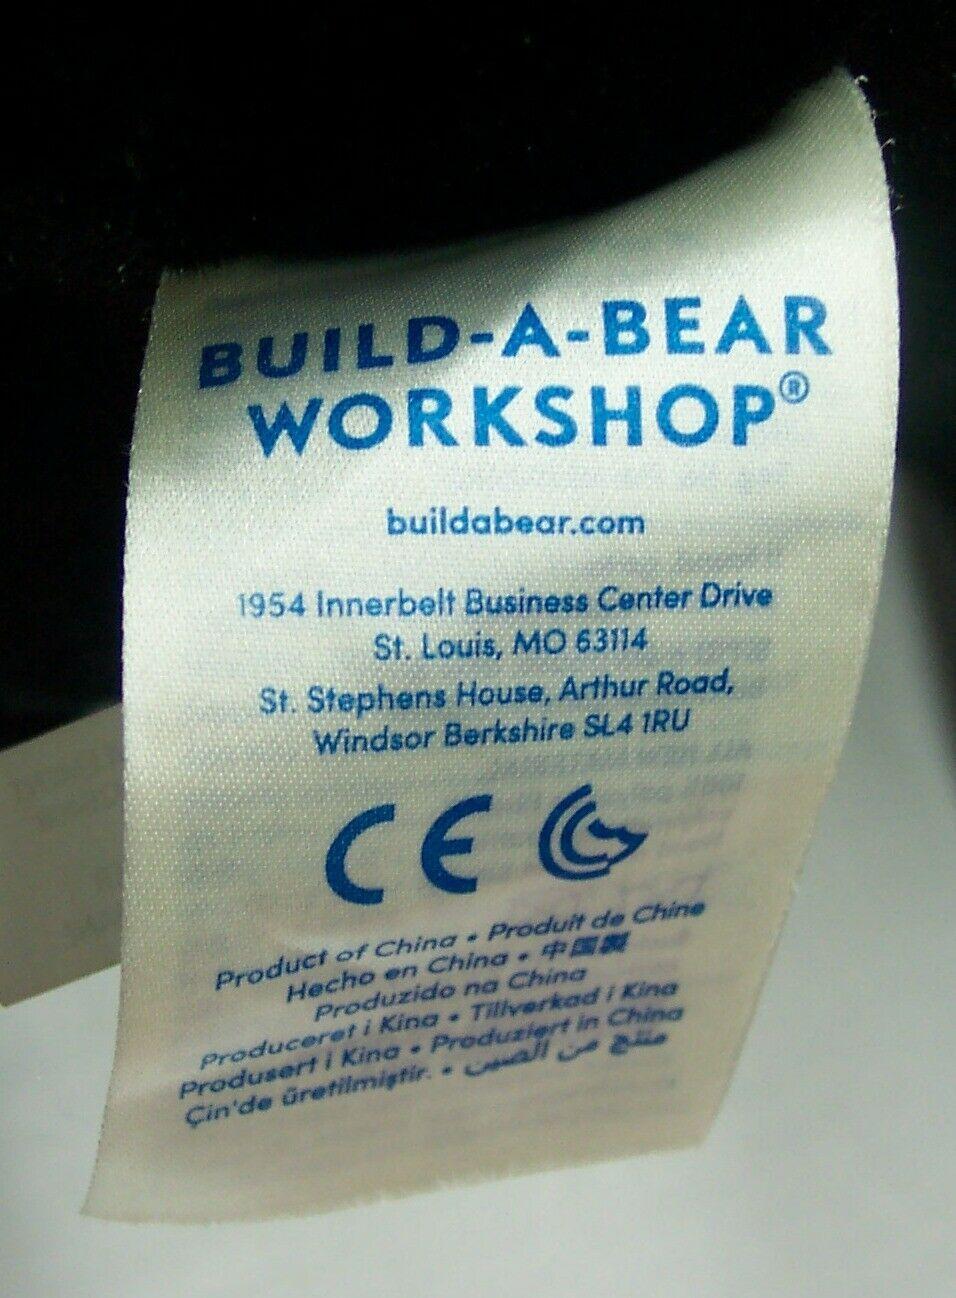 "Build-A-Bear Star Wars BEAR AS DARTH VADER 18"" Plush STUFFED ANIMAL TOY"